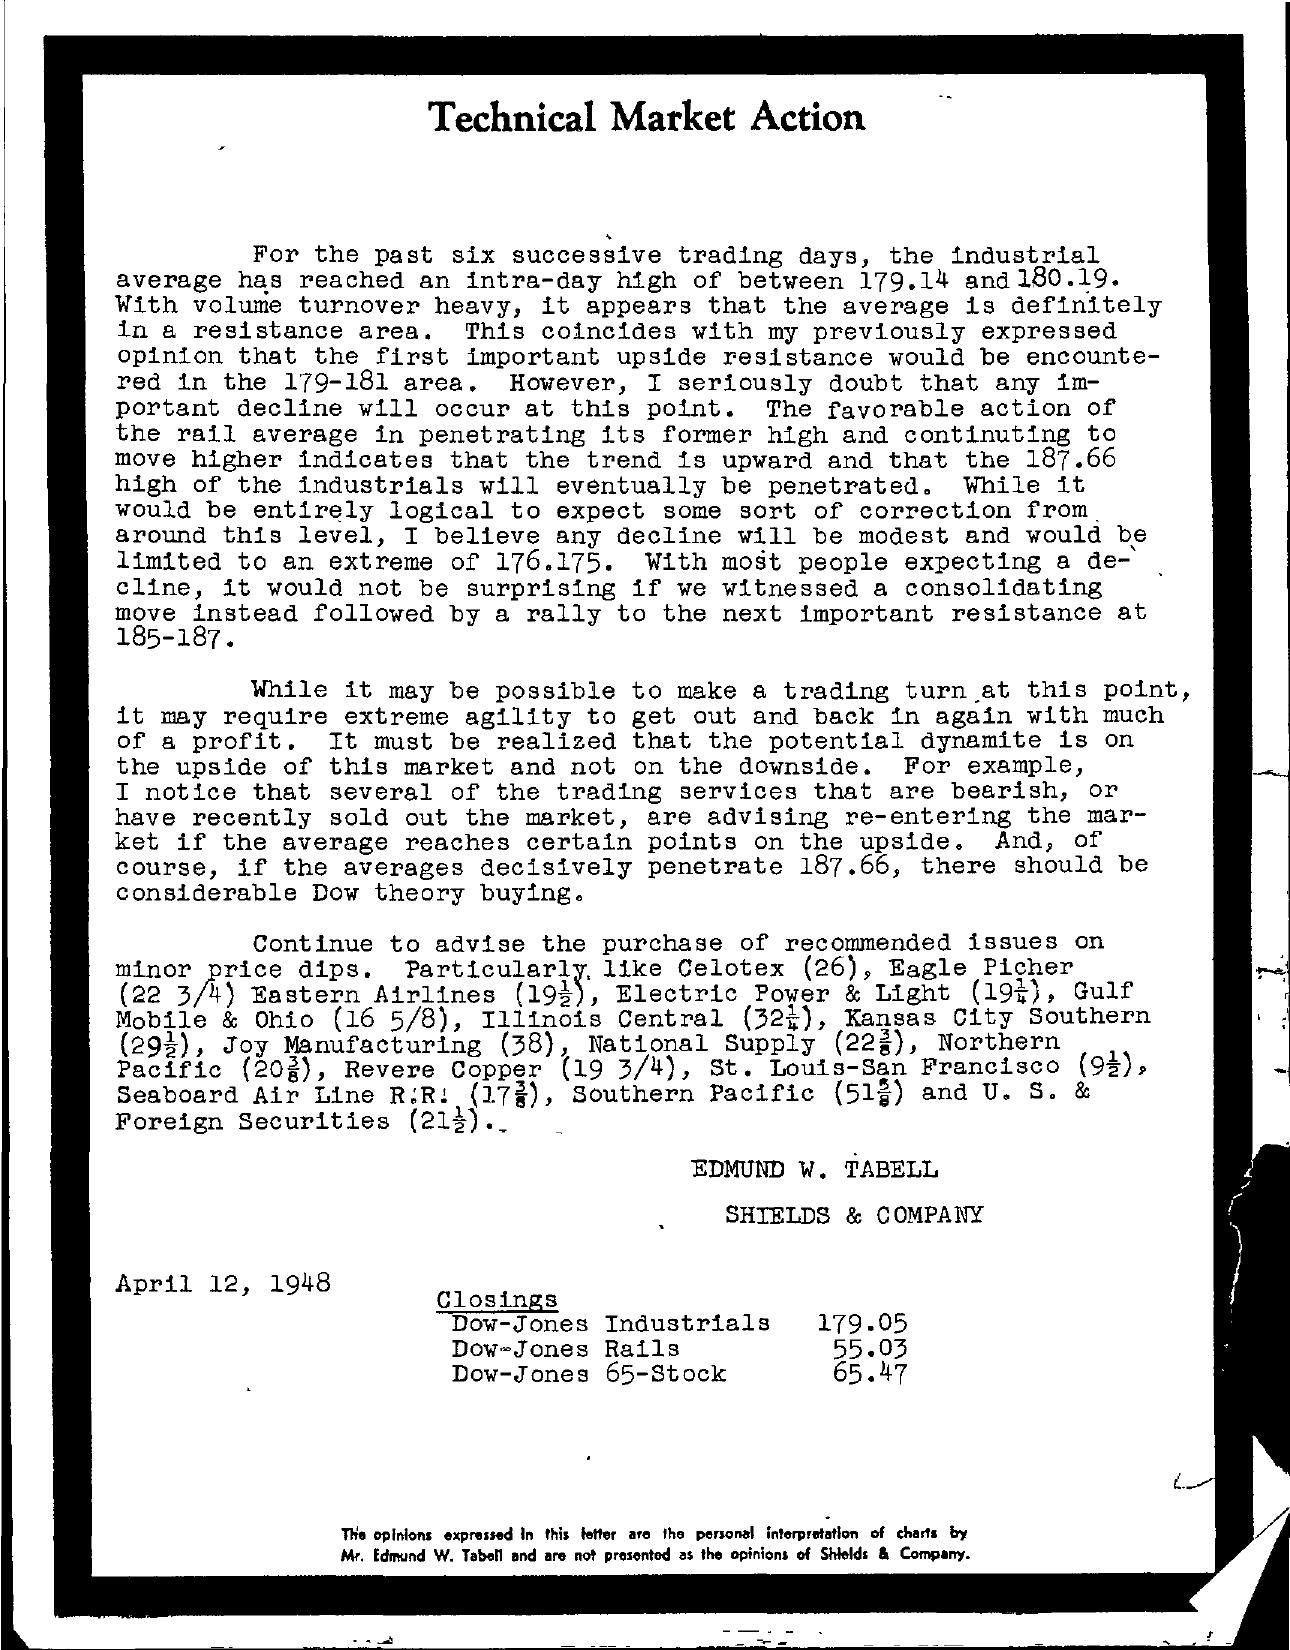 Tabell's Market Letter - April 12, 1948